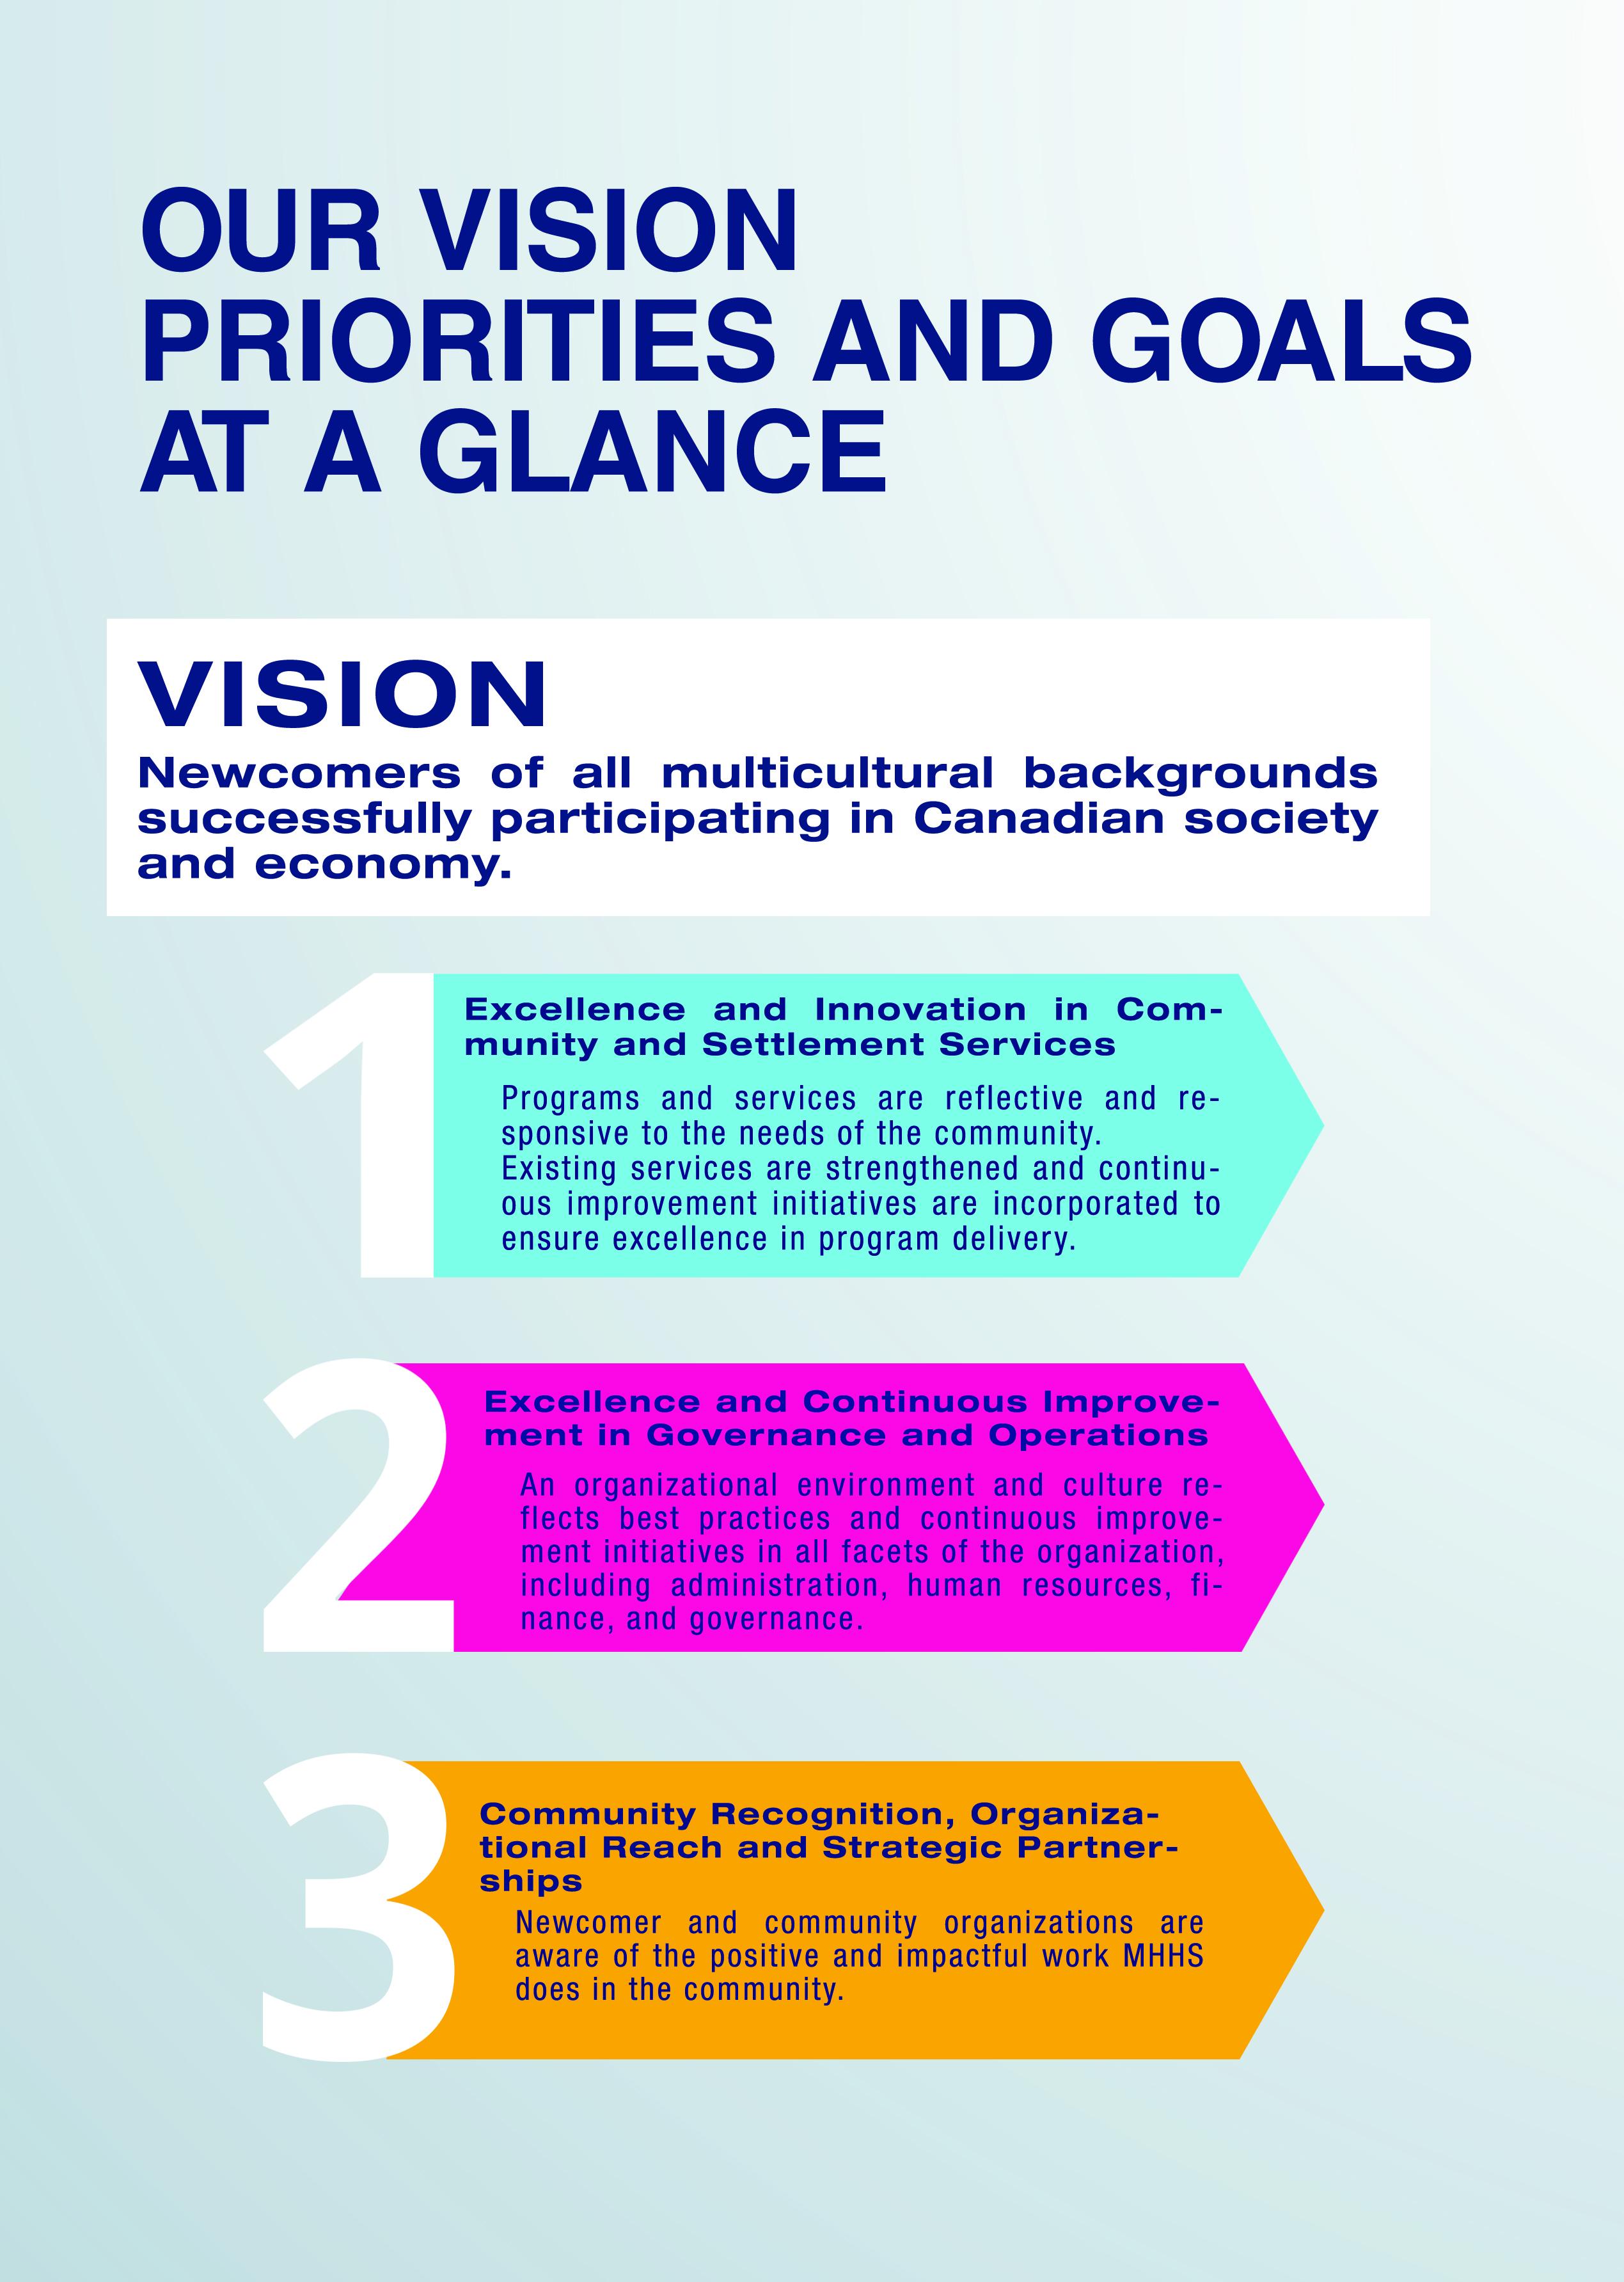 https://0901.nccdn.net/4_2/000/000/038/2d3/vision--priorities-and-goals-at-a-glance.jpg